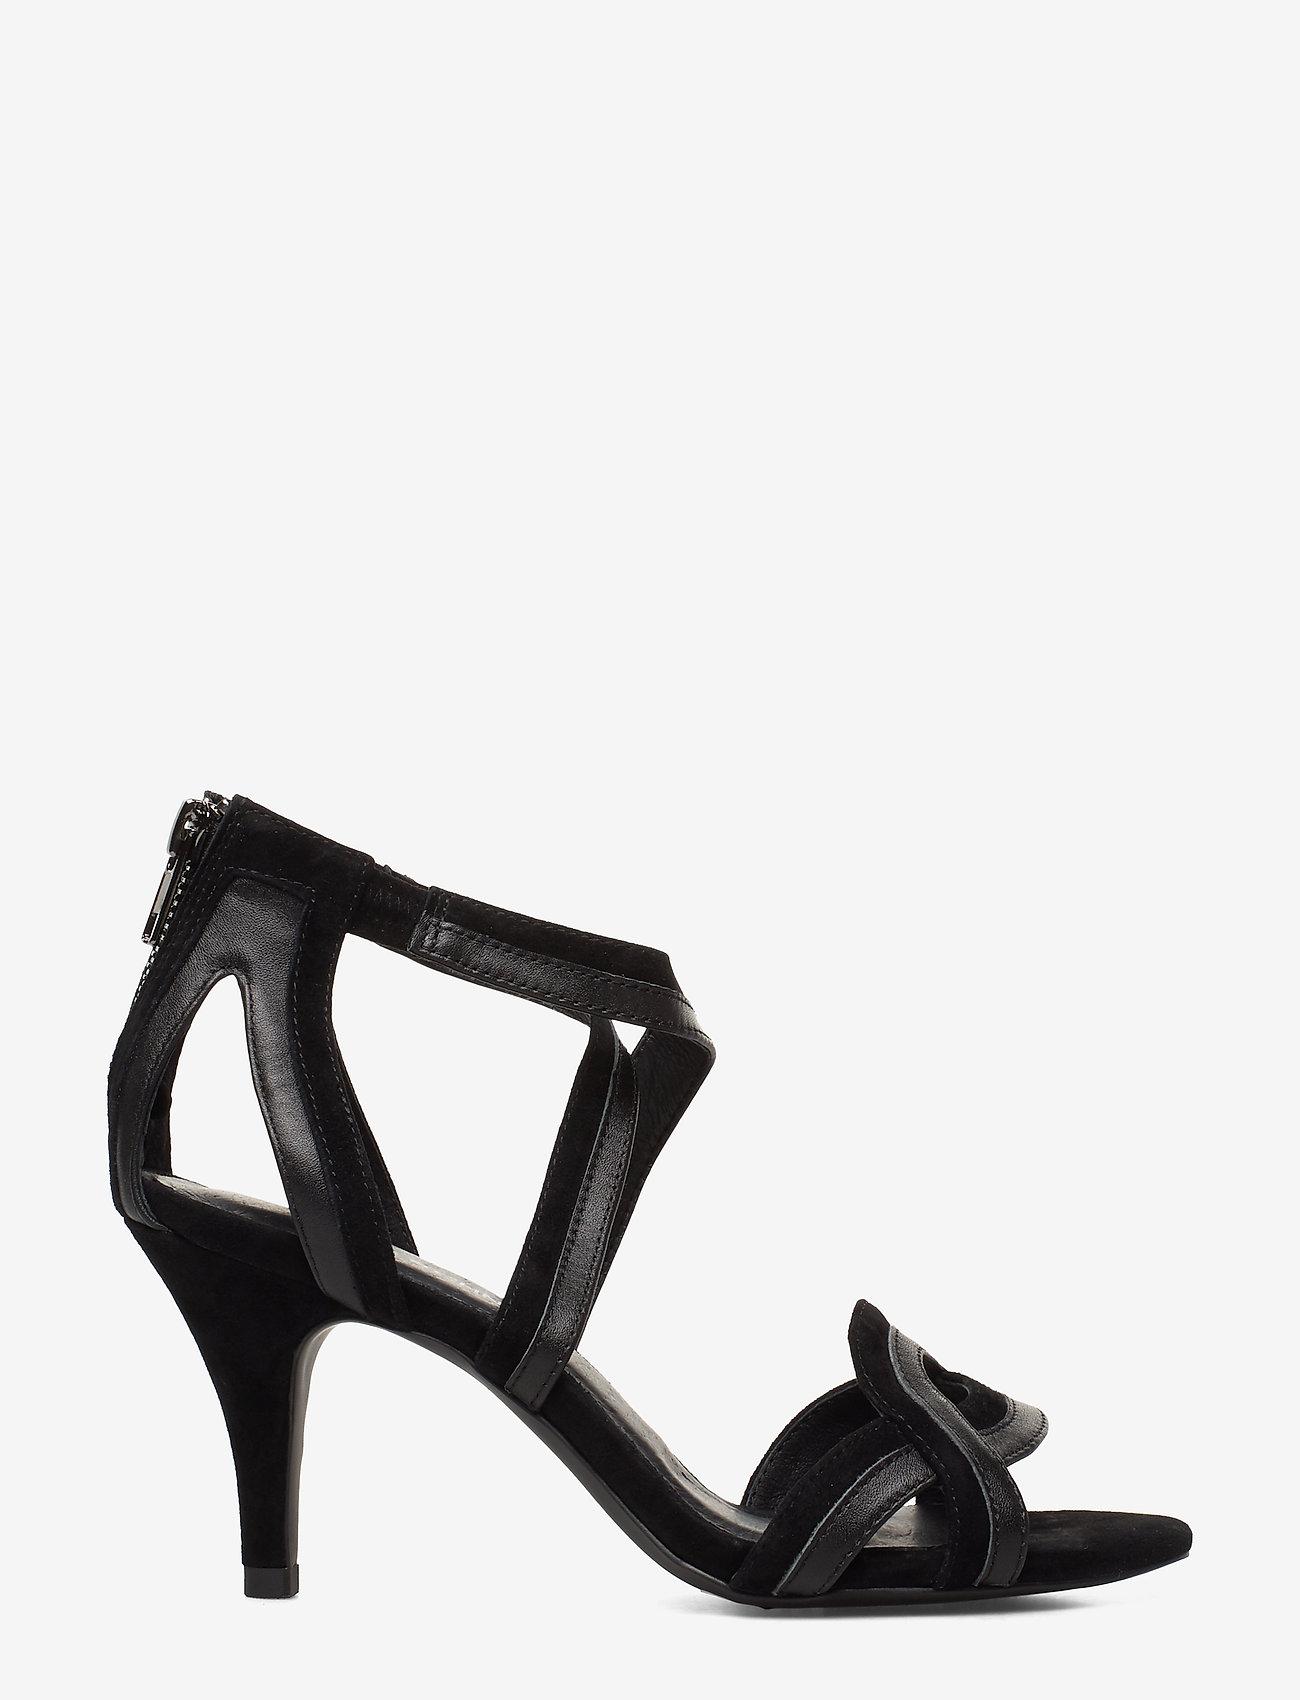 Sofie Schnoor - Sandal - sandales à talons - black - 1